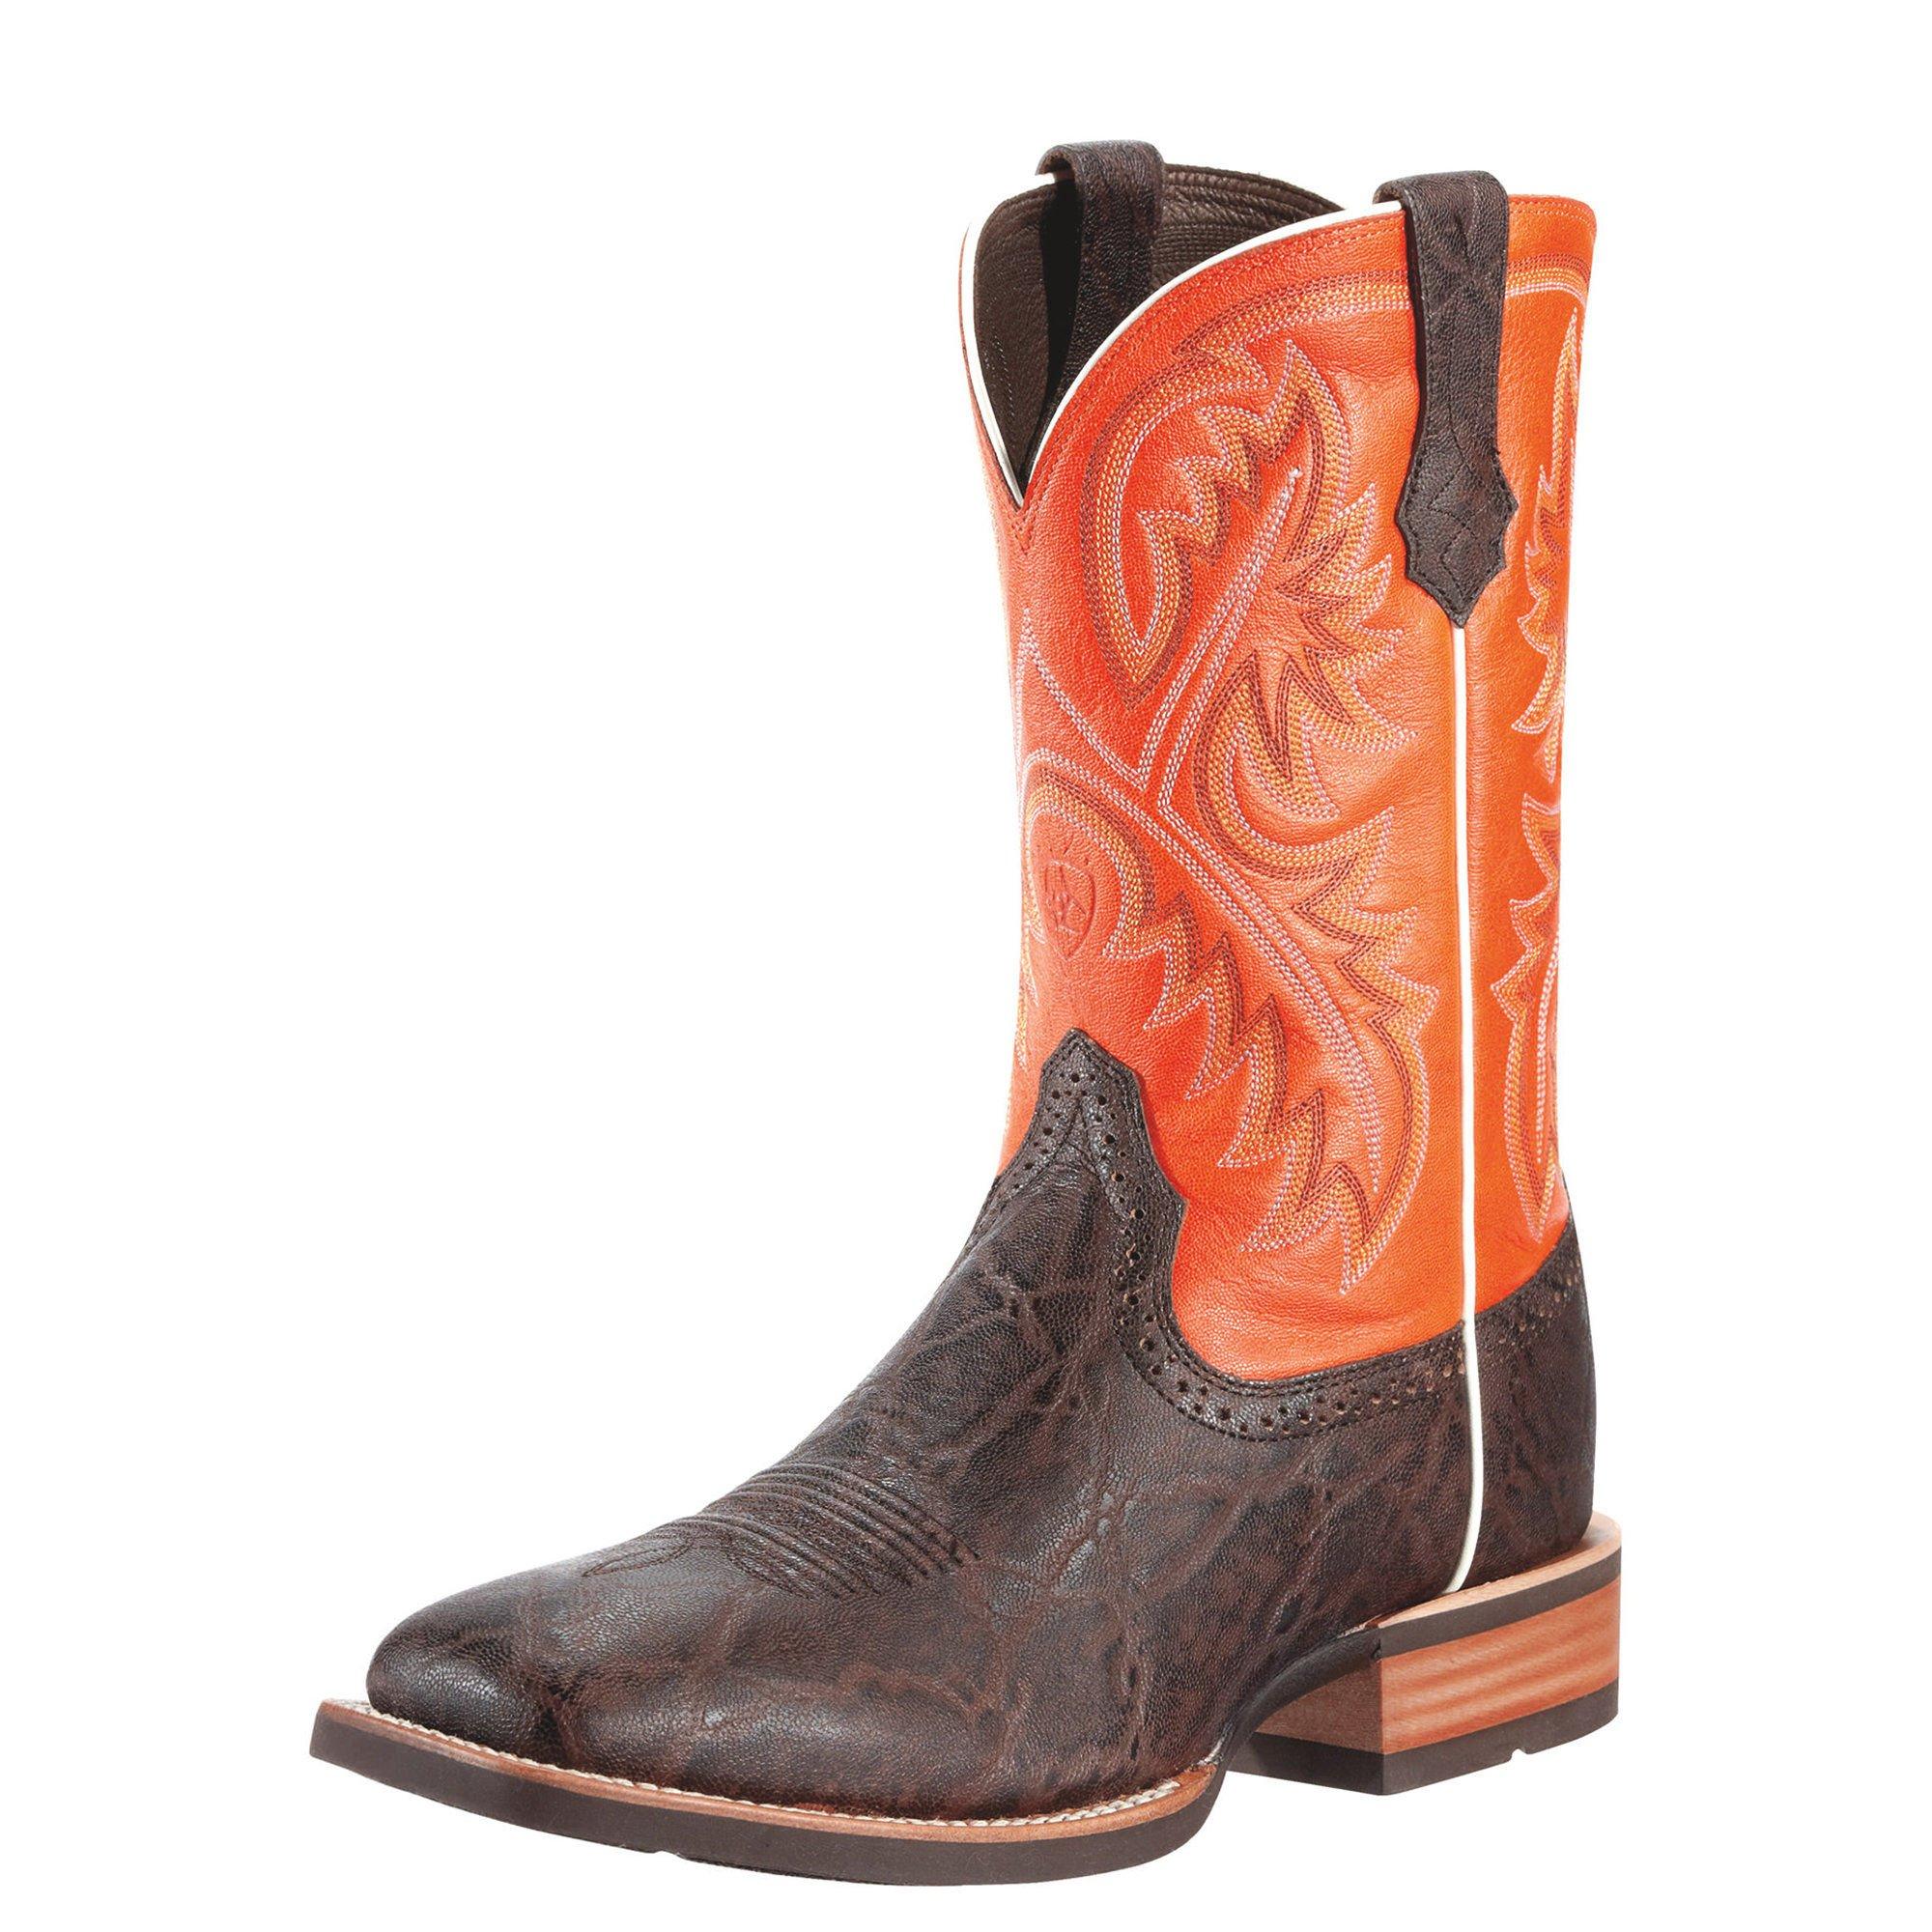 Ariat Men's Quickdraw Western Cowboy Boot, Chocolate Elephant/Mandarin, 10.5 2E US